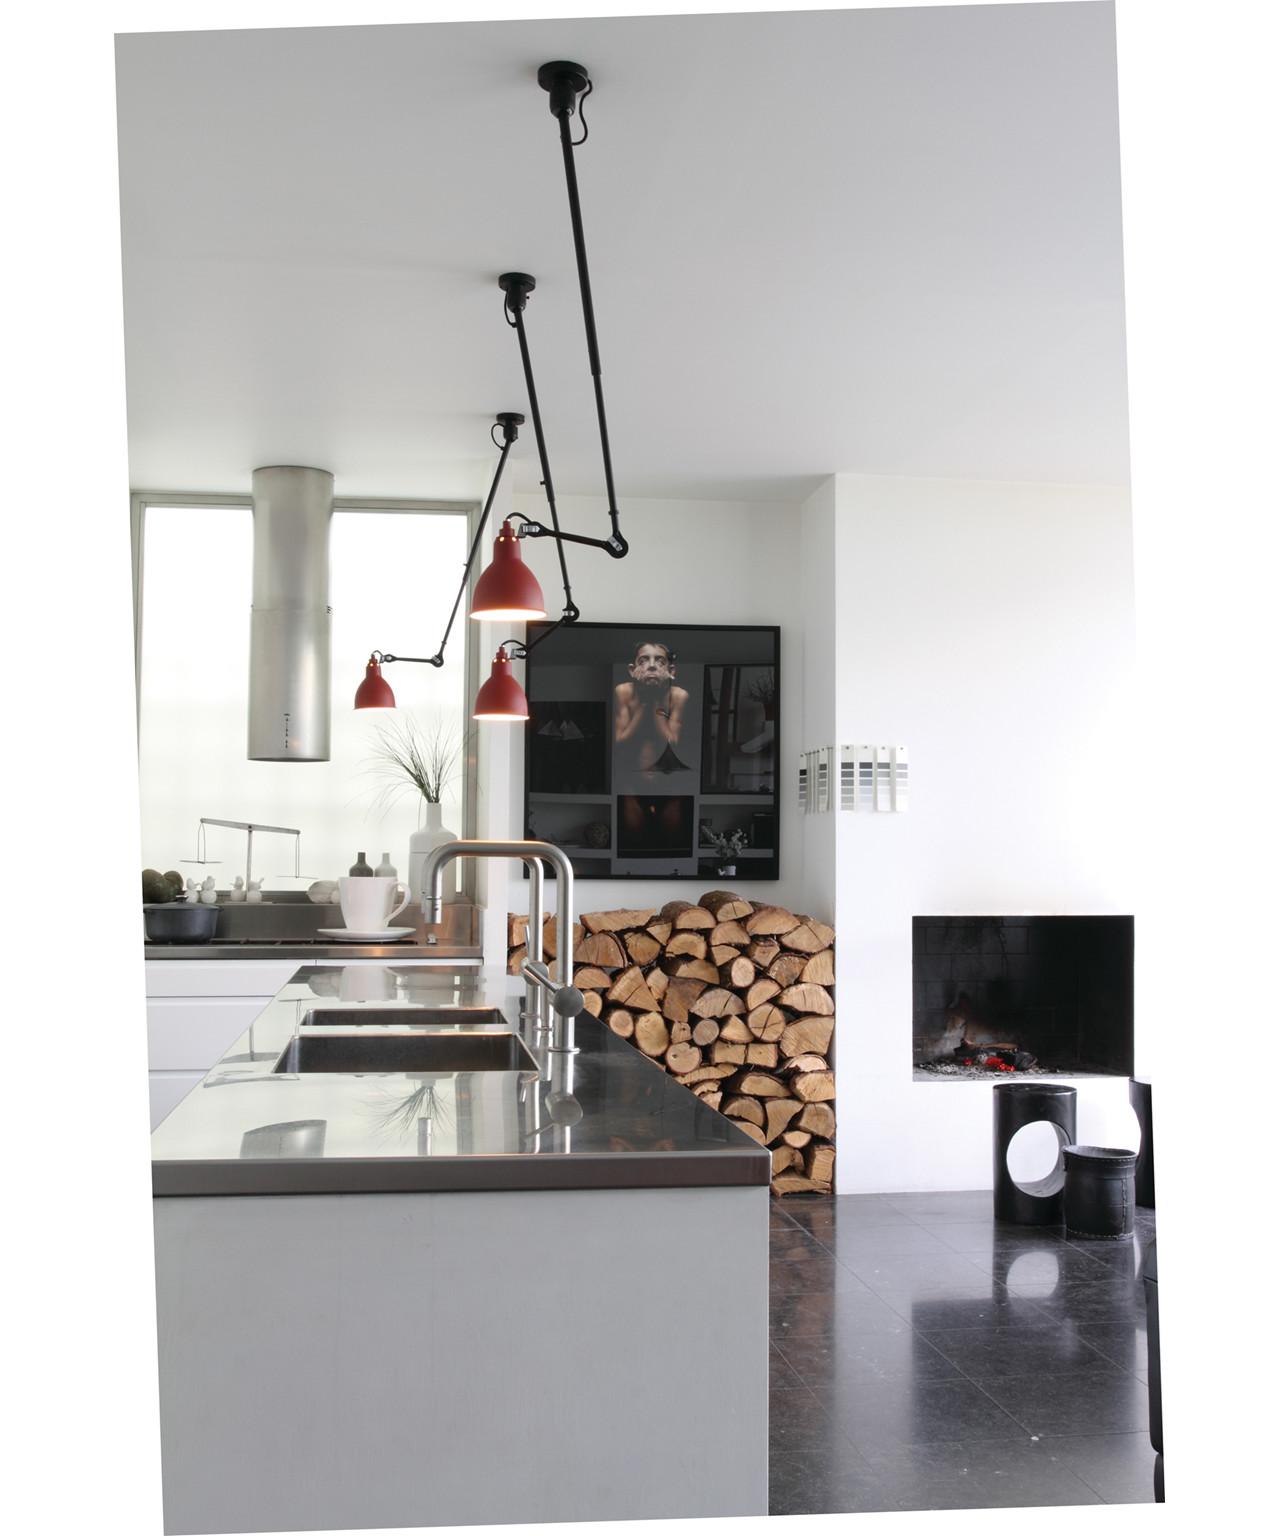 302 rot deckenleuchte lampe gras lampemesteren. Black Bedroom Furniture Sets. Home Design Ideas